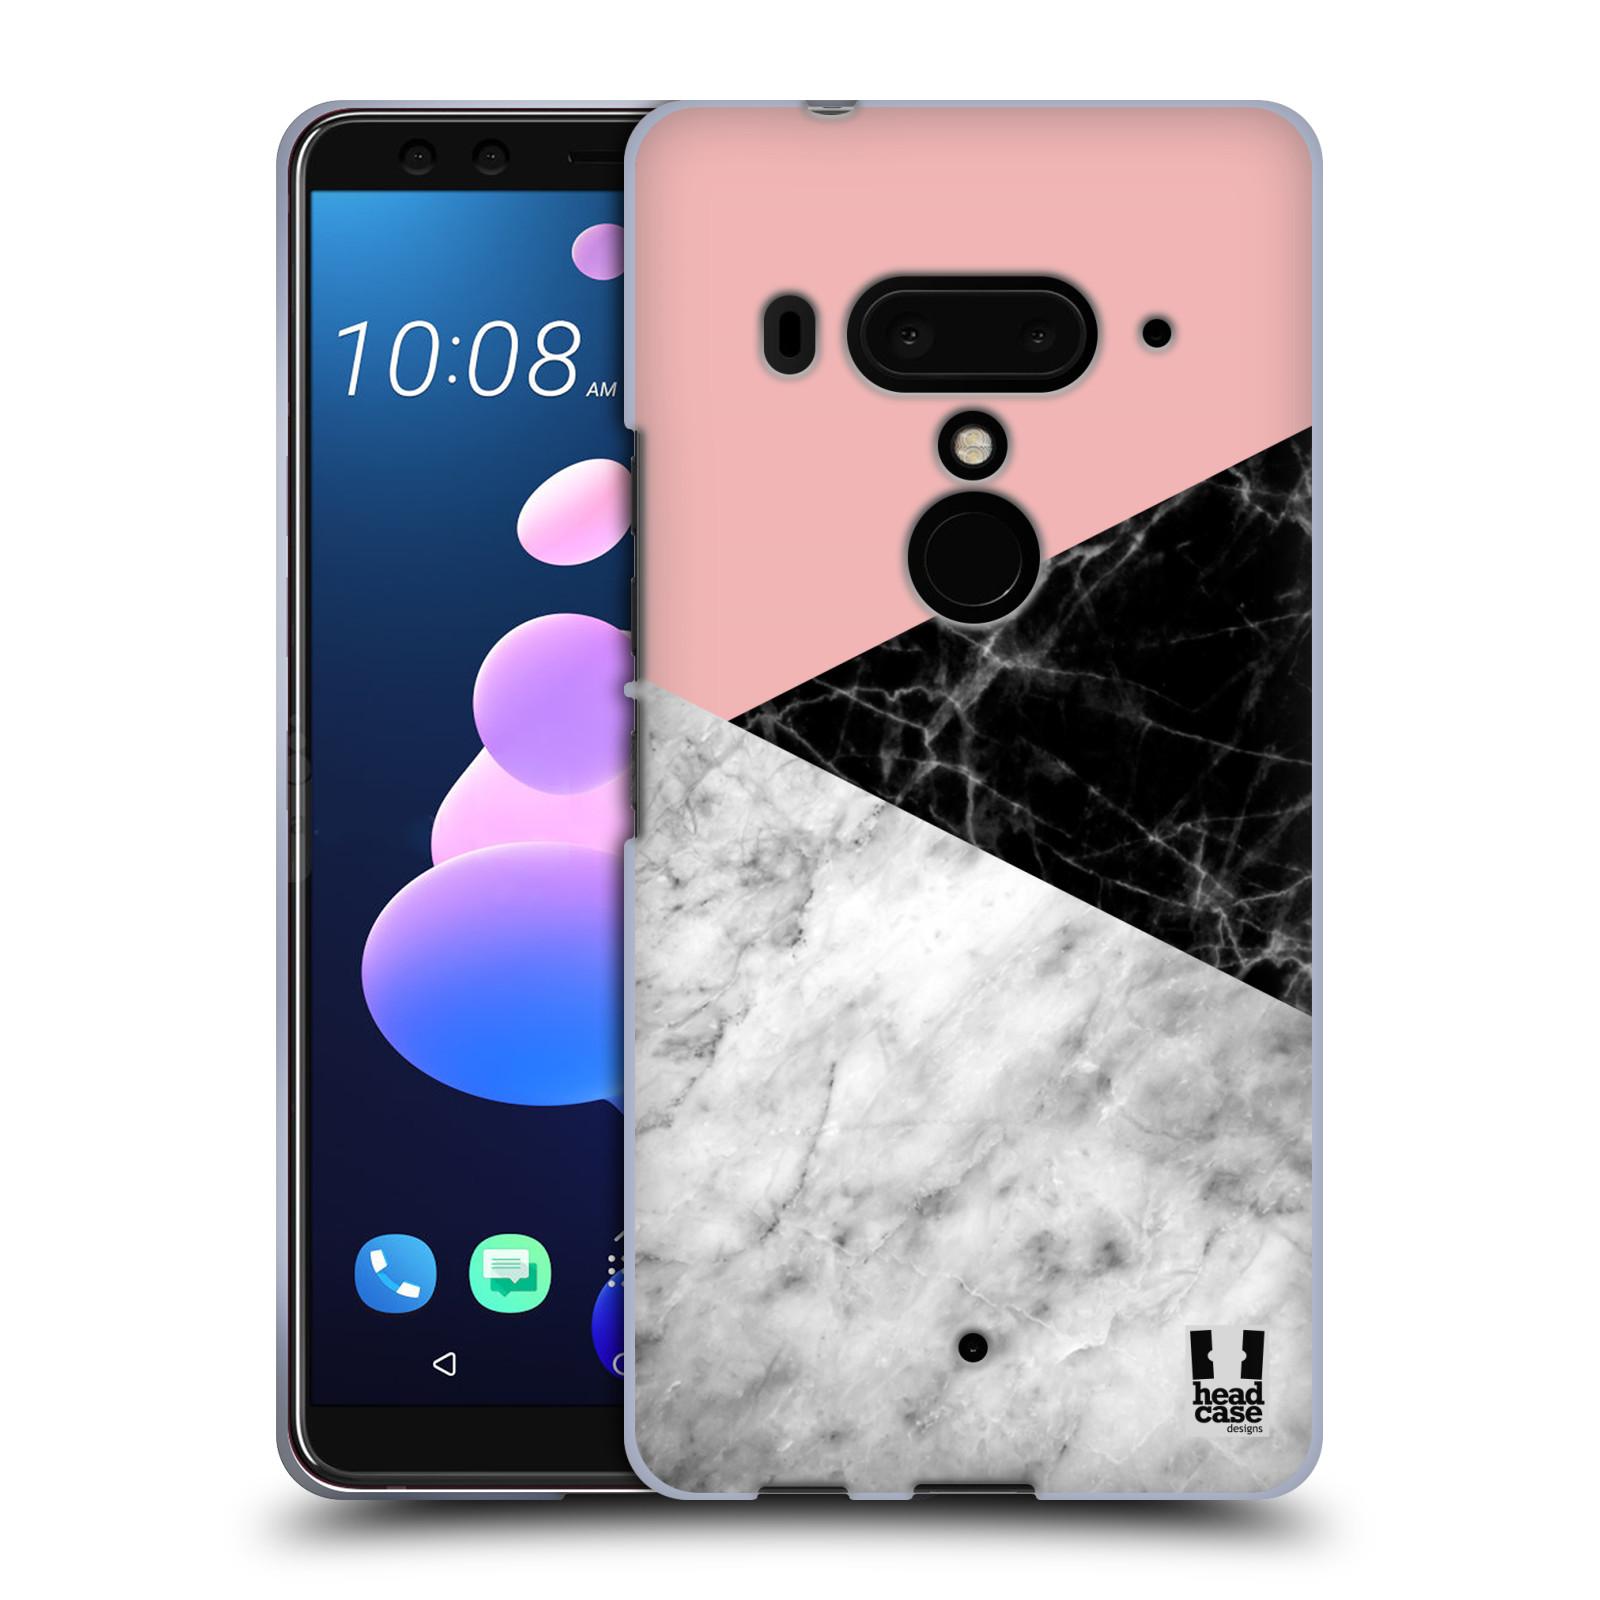 Silikonové pouzdro na mobil HTC U12 Plus - Head Case - Mramor mix